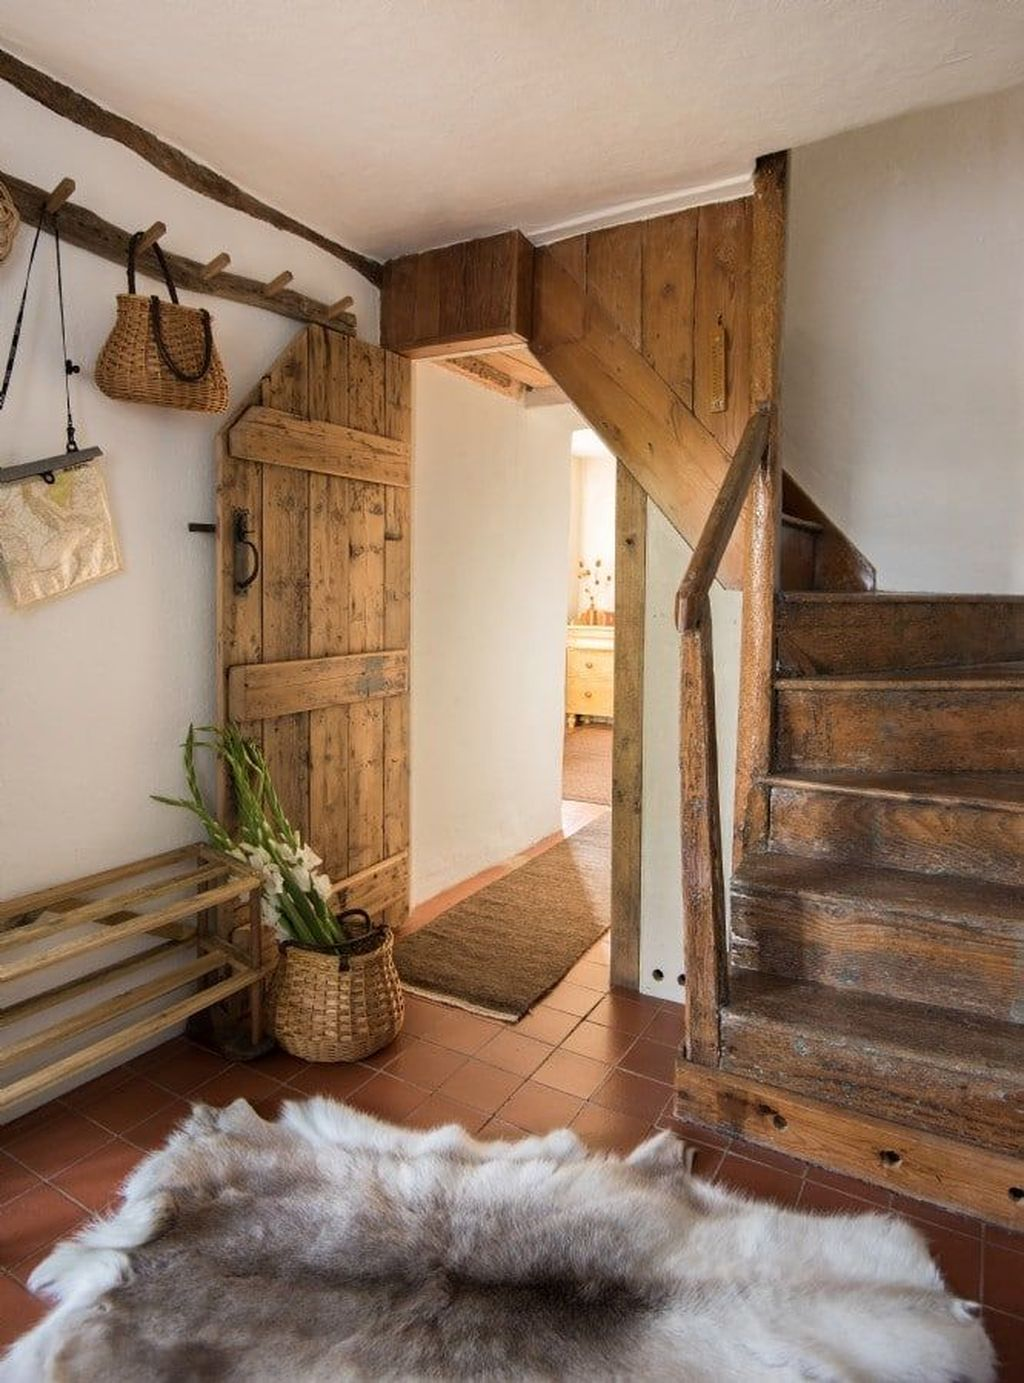 Stunning Farmhouse Interior Design Ideas To Realize Your Dreams 06